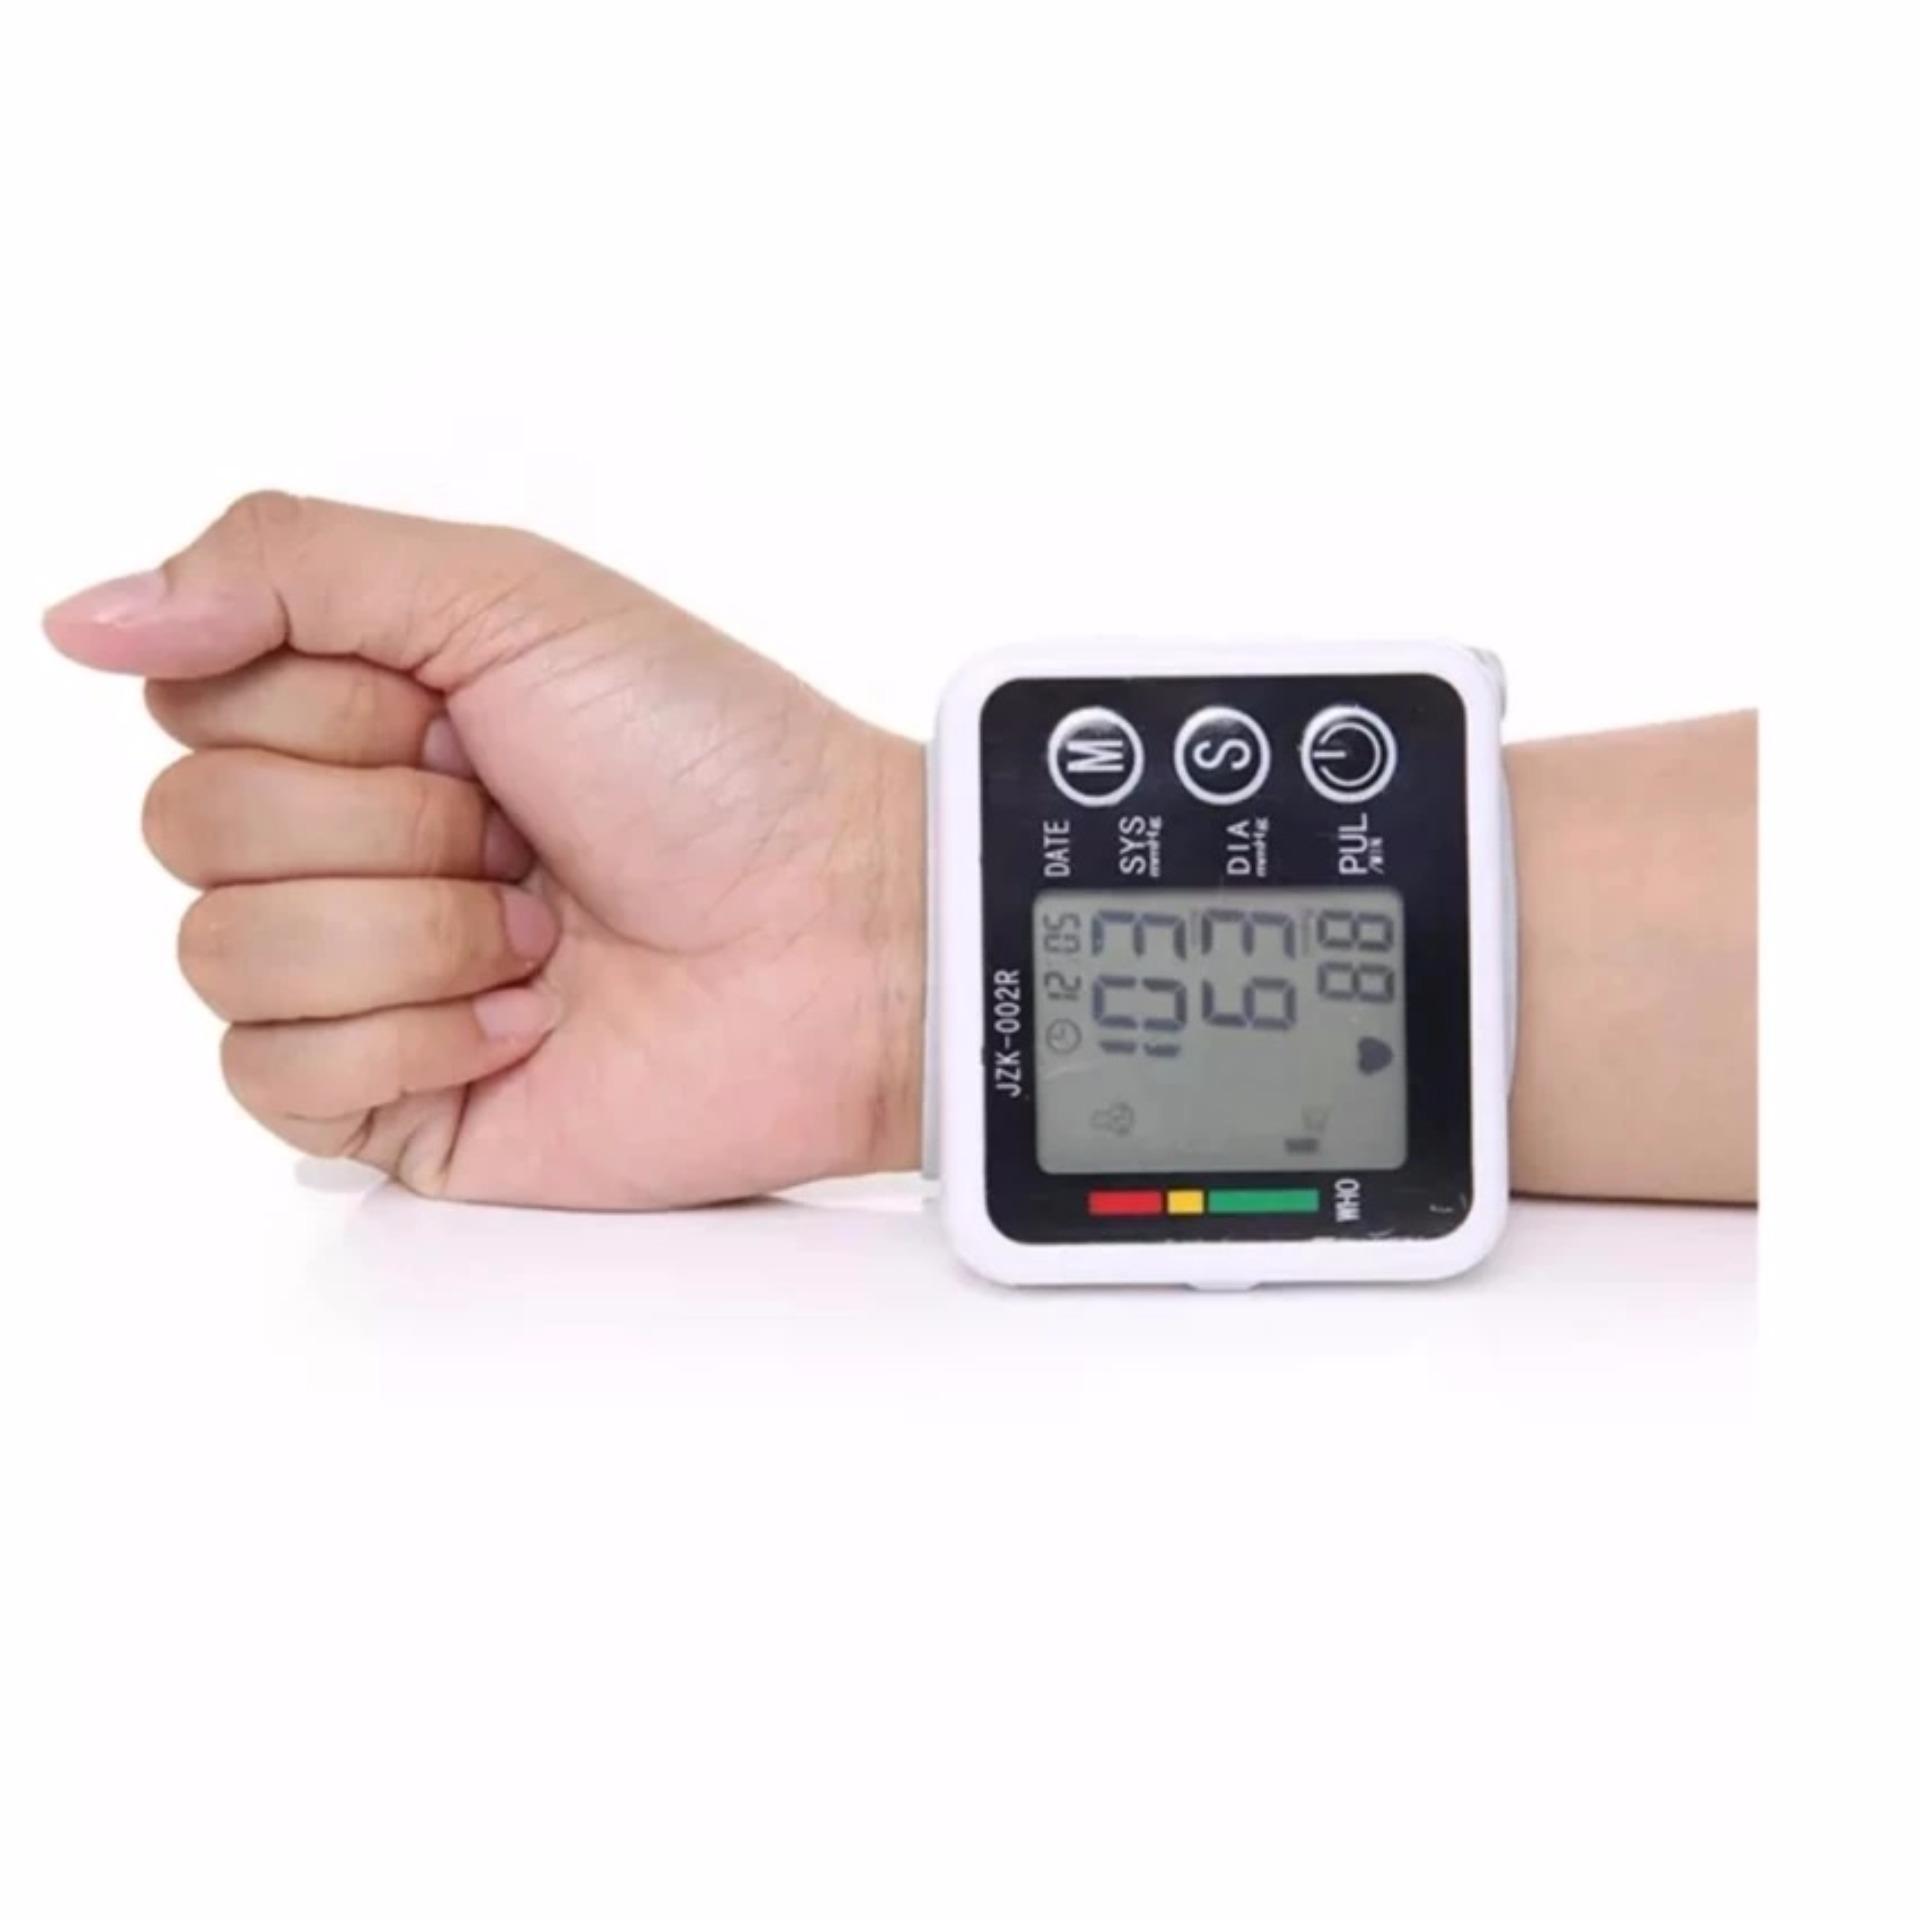 Anggaran Terbaik Tensi Digital Alat Ukur Tekanan Darah Tinggi Tensimeter Wristband